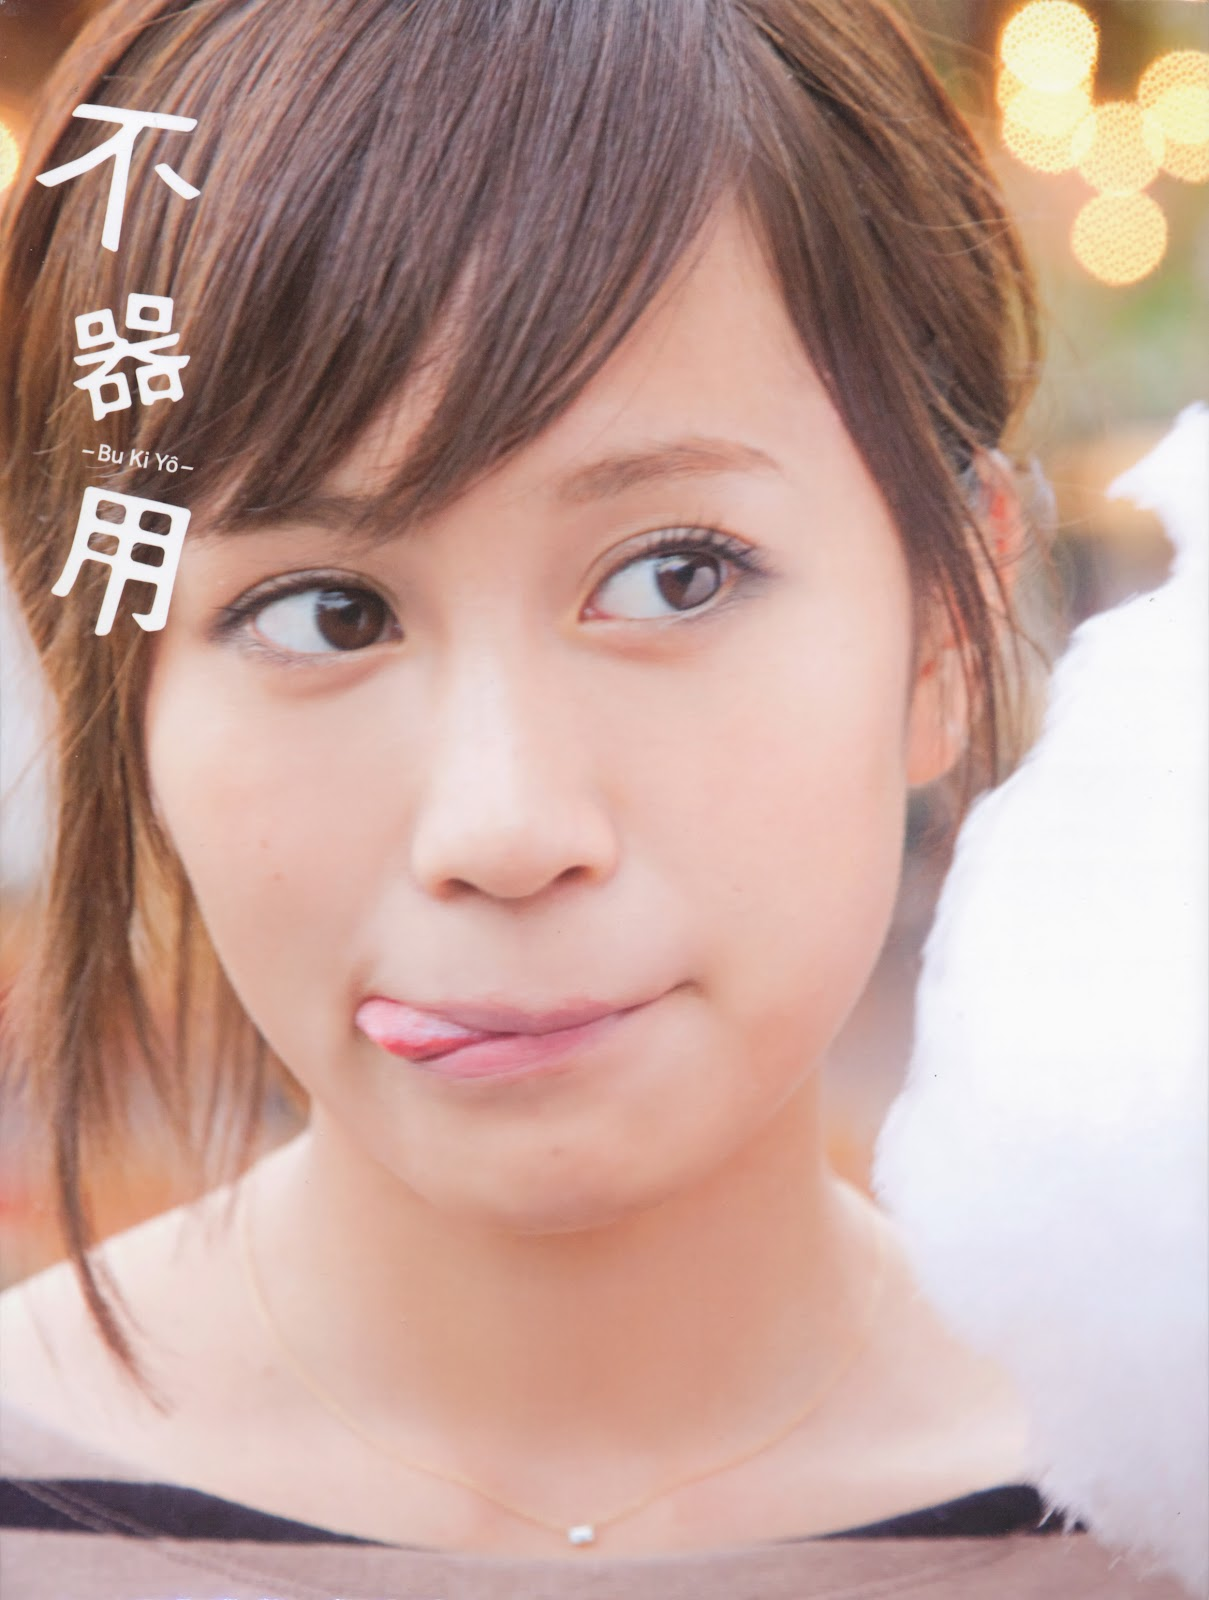 Maeda Atsuko photobook Acchan - AKB48 Photo (38215307